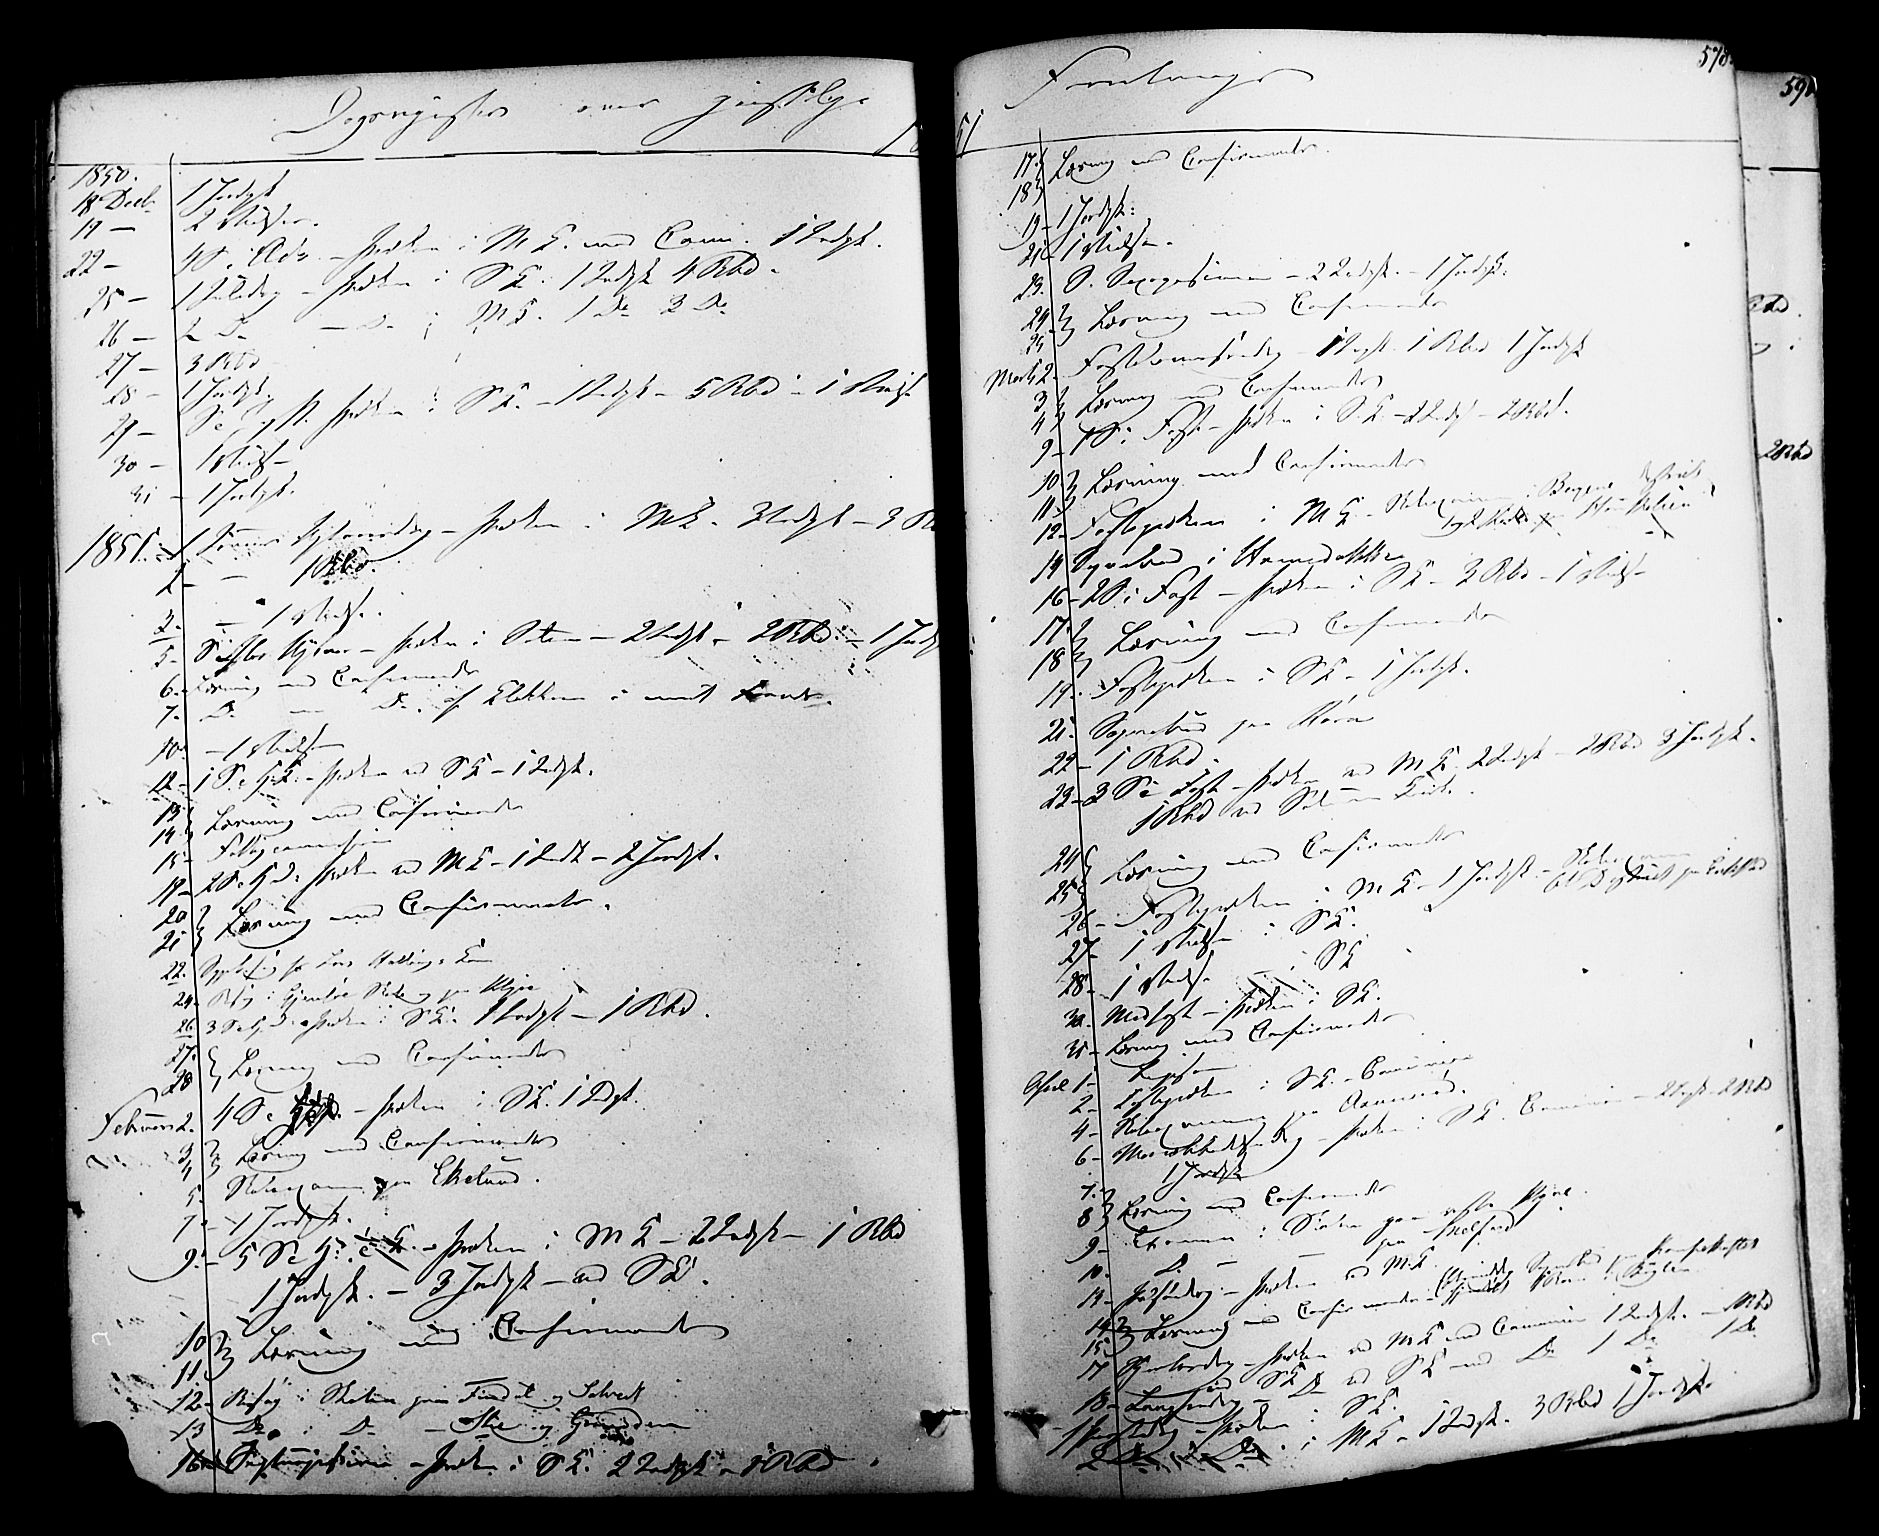 SAKO, Solum kirkebøker, F/Fa/L0006: Ministerialbok nr. I 6, 1844-1855, s. 578